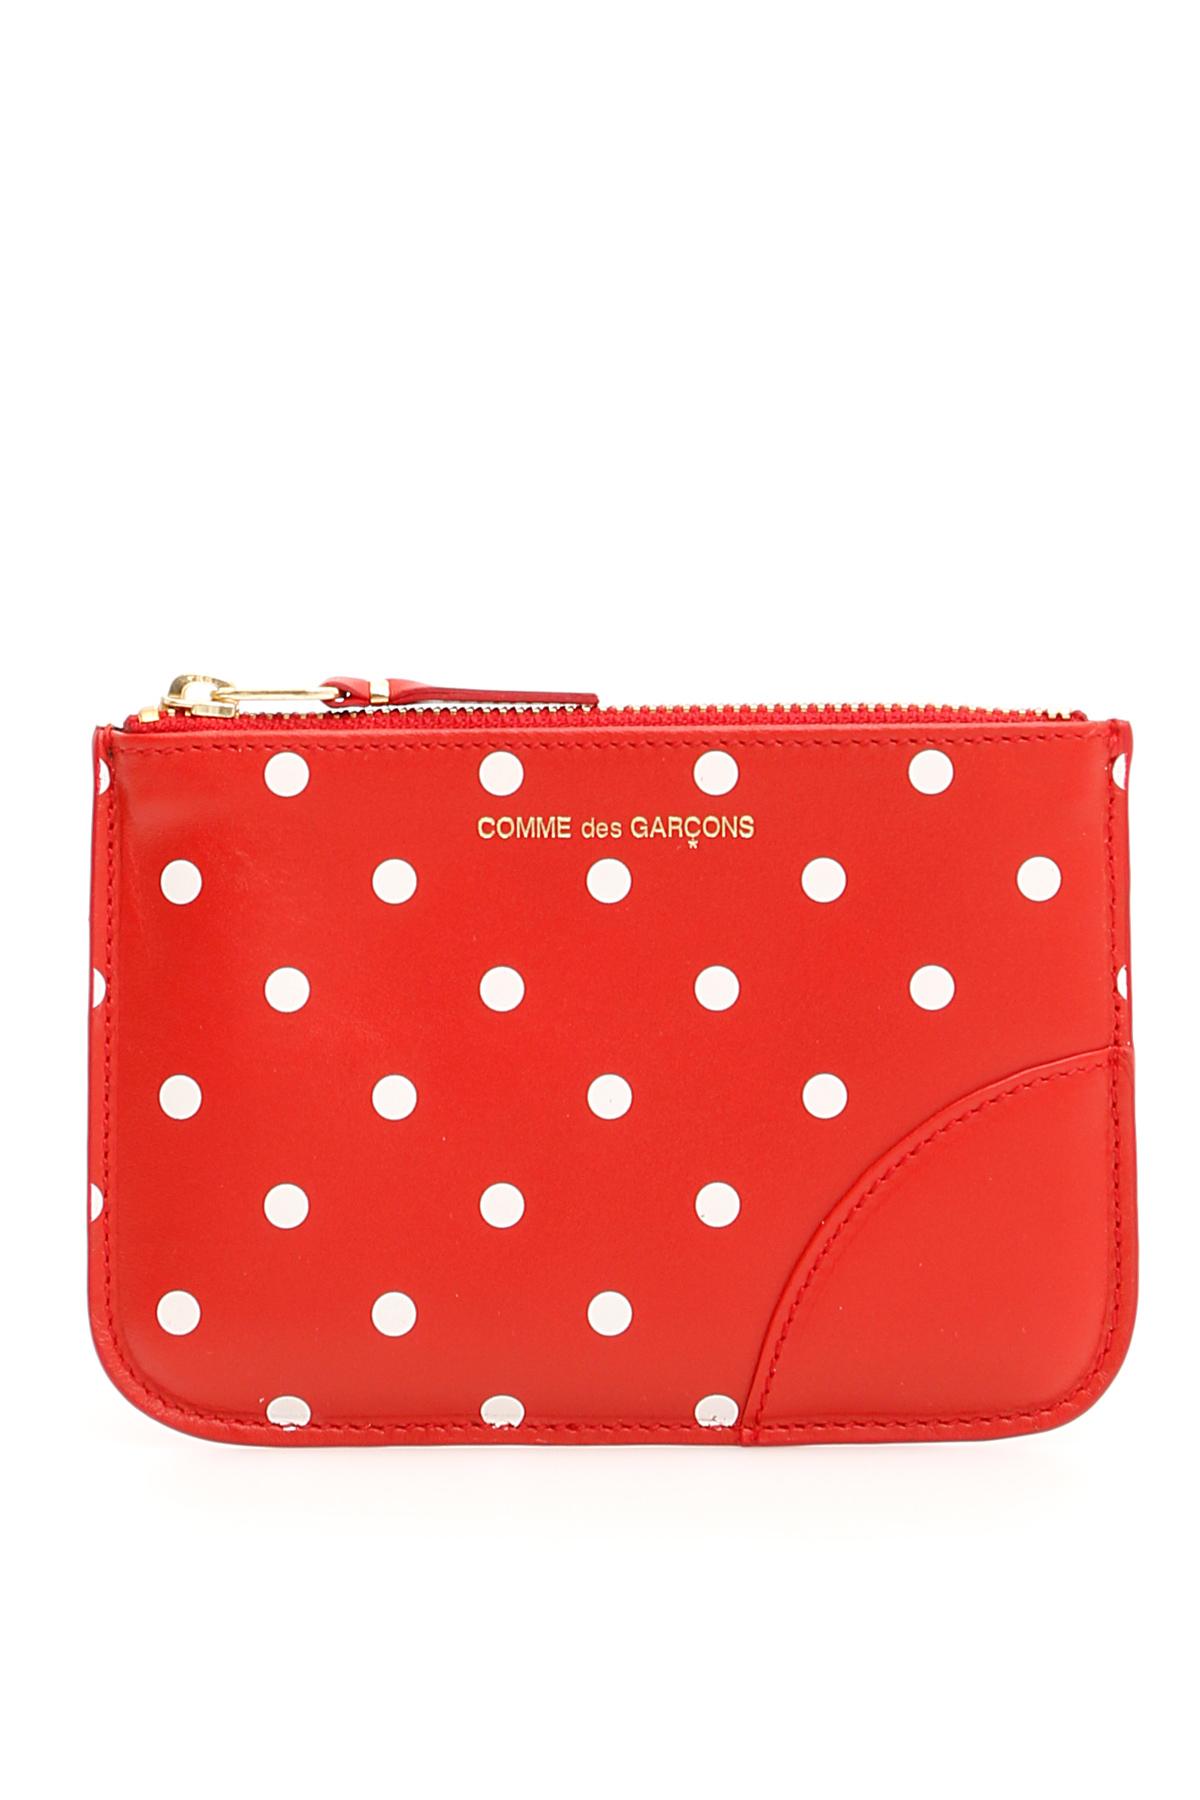 Comme des garcons wallet pouch polka dots